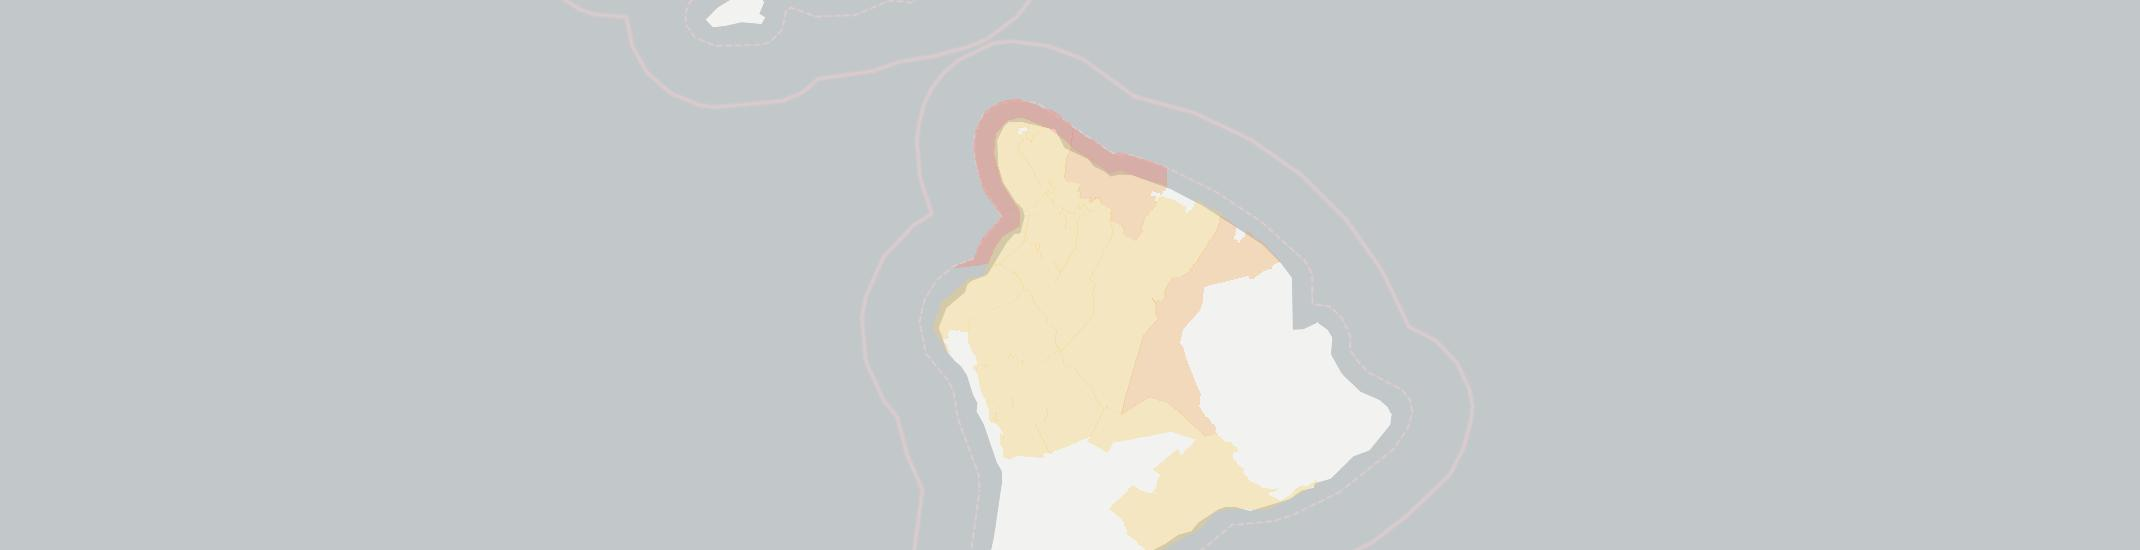 7 Best Internet Service Providers in Kamuela, HI (Updated 2019) Kamuela Hi Map on maunaloa hi map, kailua hi map, maili hi map, hilo hi map, pahoa hi map, wahiawa hi map, kohala coast hi map, mililani hi map, koloa hi map, kaneohe hi map, kahuku hi map, waikiki hi map, waialua hi map, lanai city hi map, kalaeloa hi map, waianae hi map, kunia hi map, kona hi map, kapolei hi map, honolulu hi map,